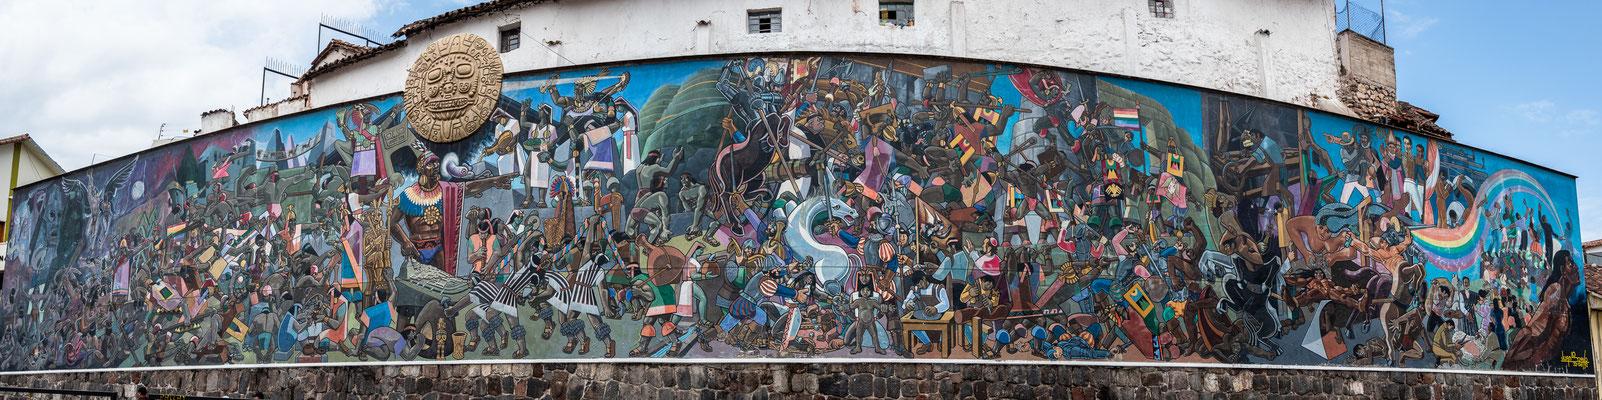 Avenida del Sol (Wandmalerei von Juan Bravo), Cusco, Nov. 2019